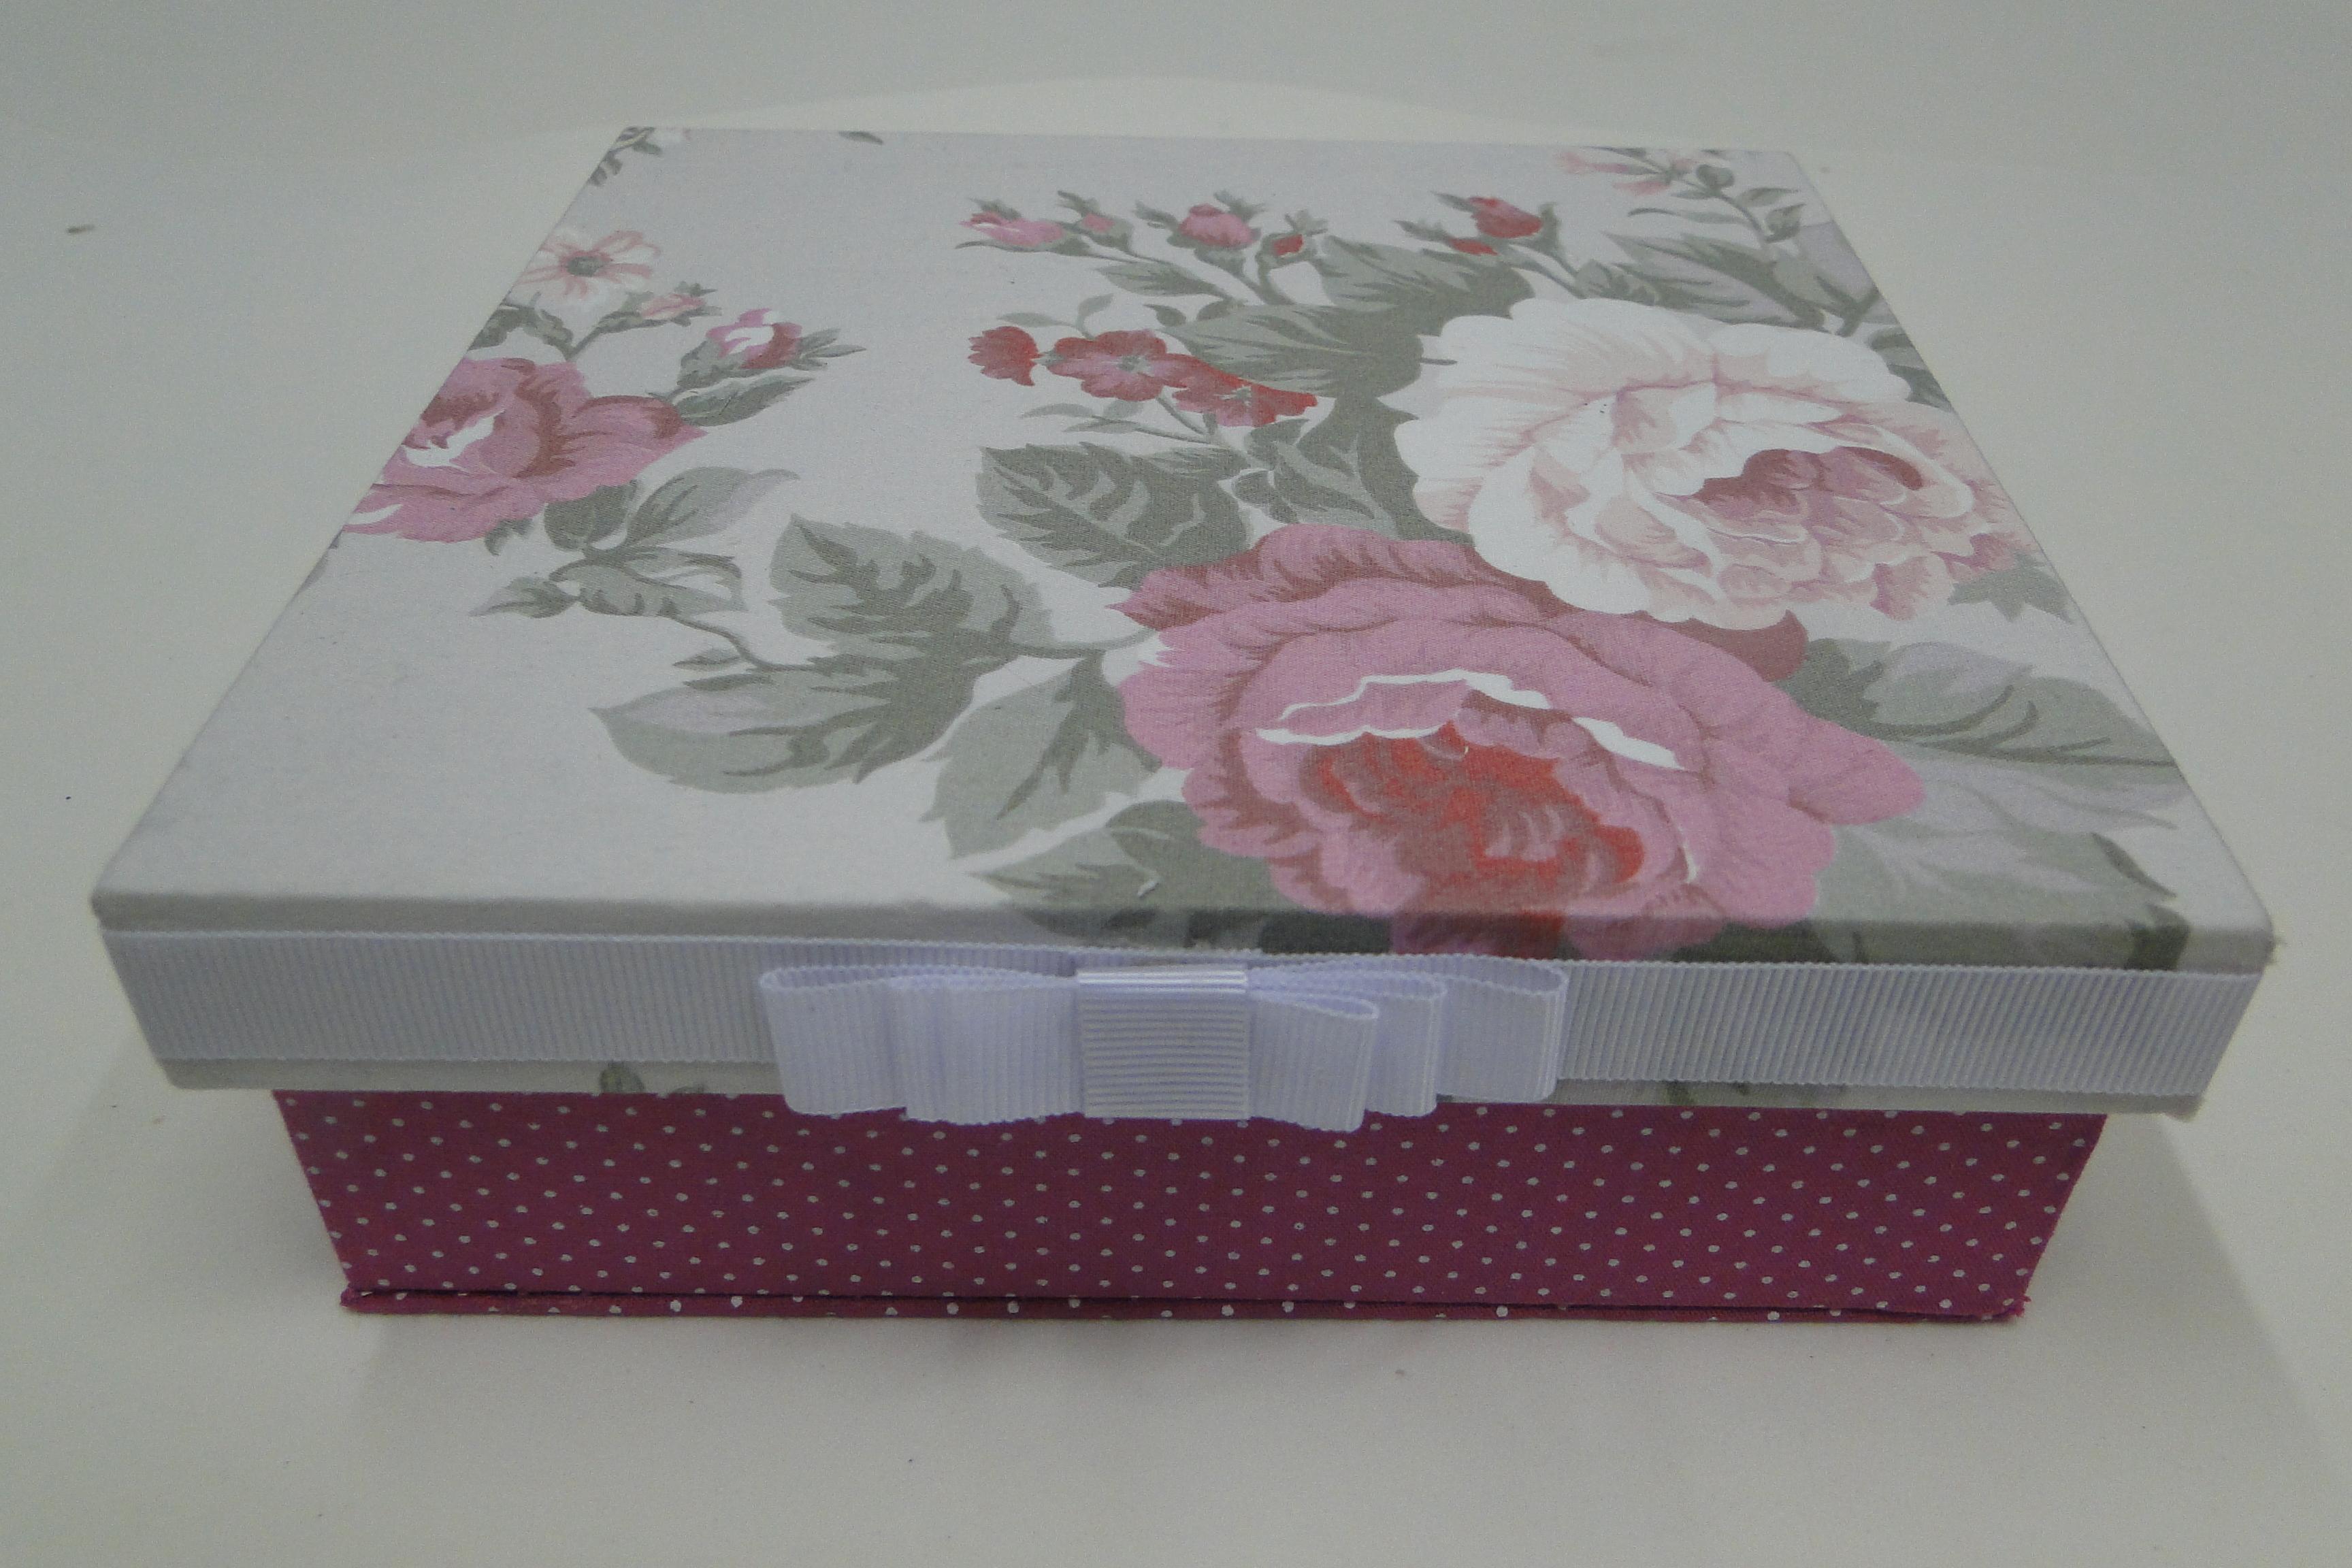 Pin Caixa Decorada On Pinterest Altered Boxes Decoupage Box And  #4B2835 3456x2304